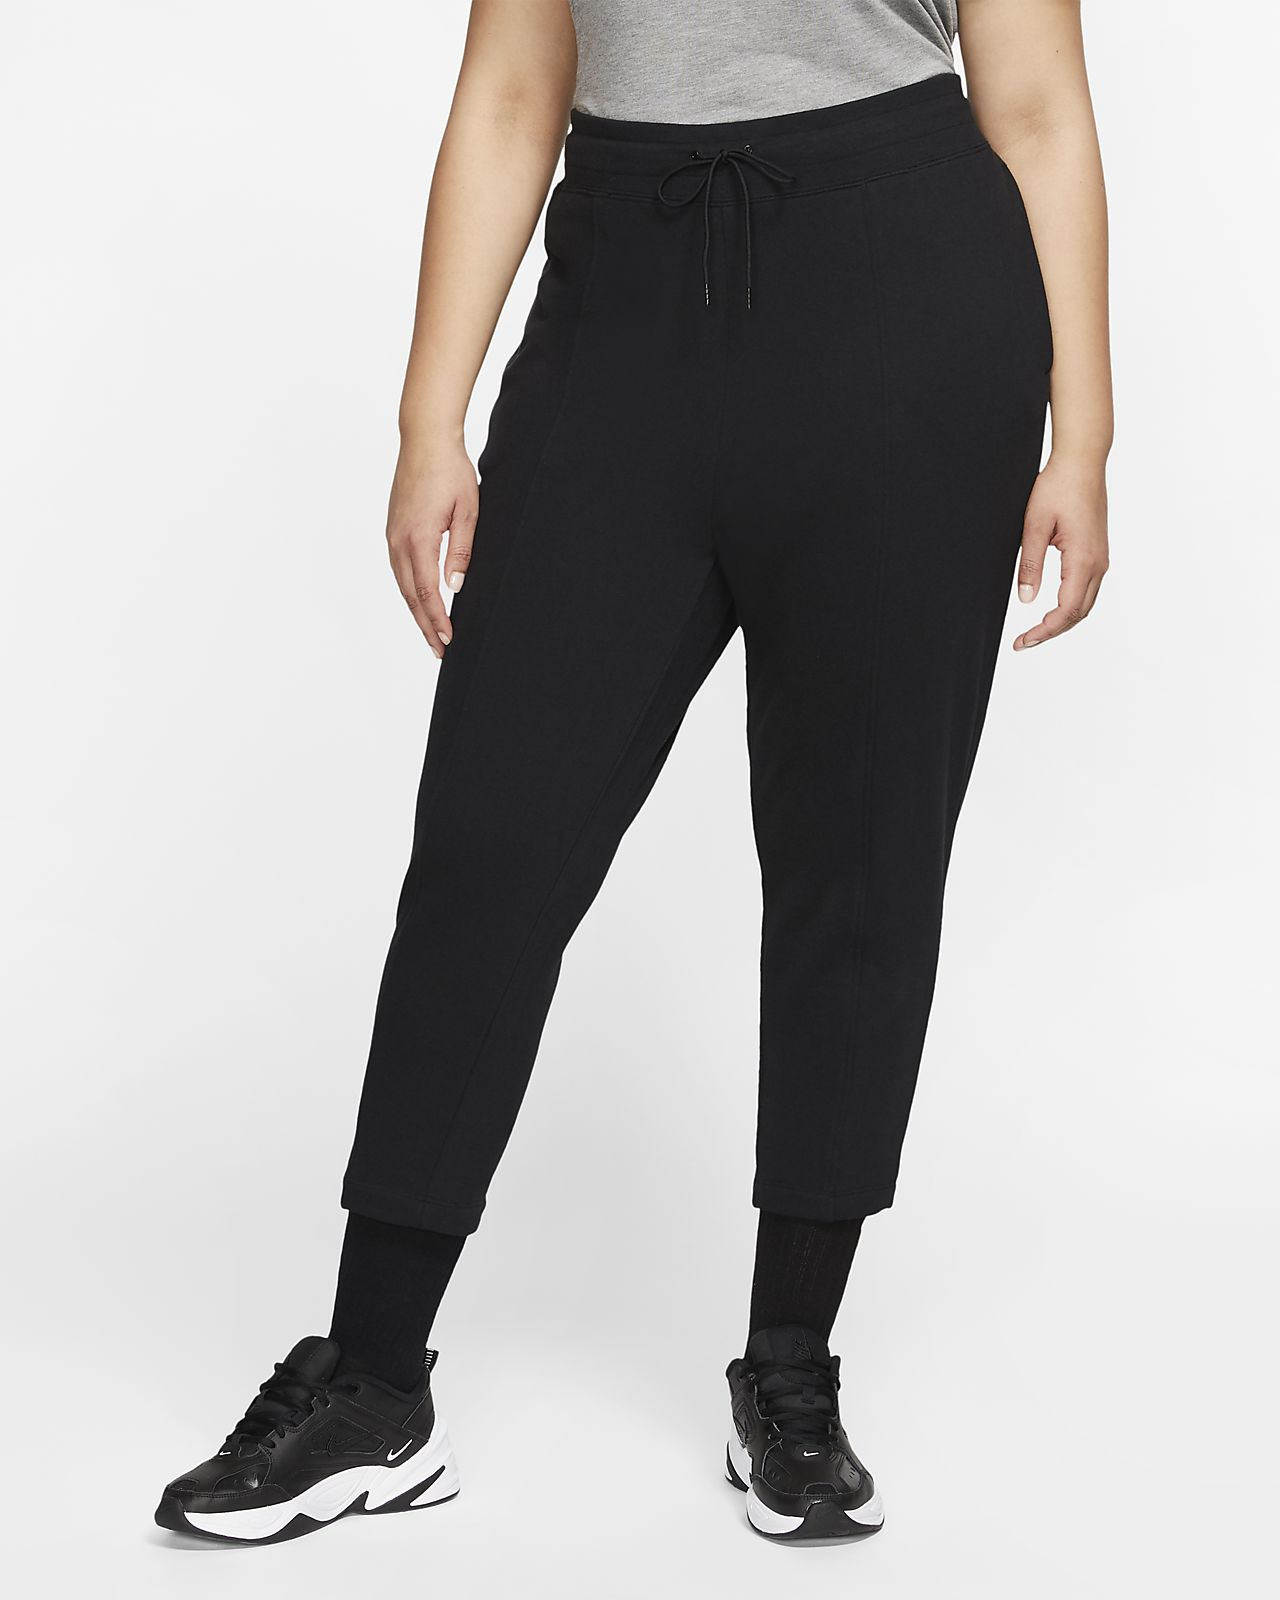 Nike Sportswear Swoosh French Terry Hose für Damen (große Größe)